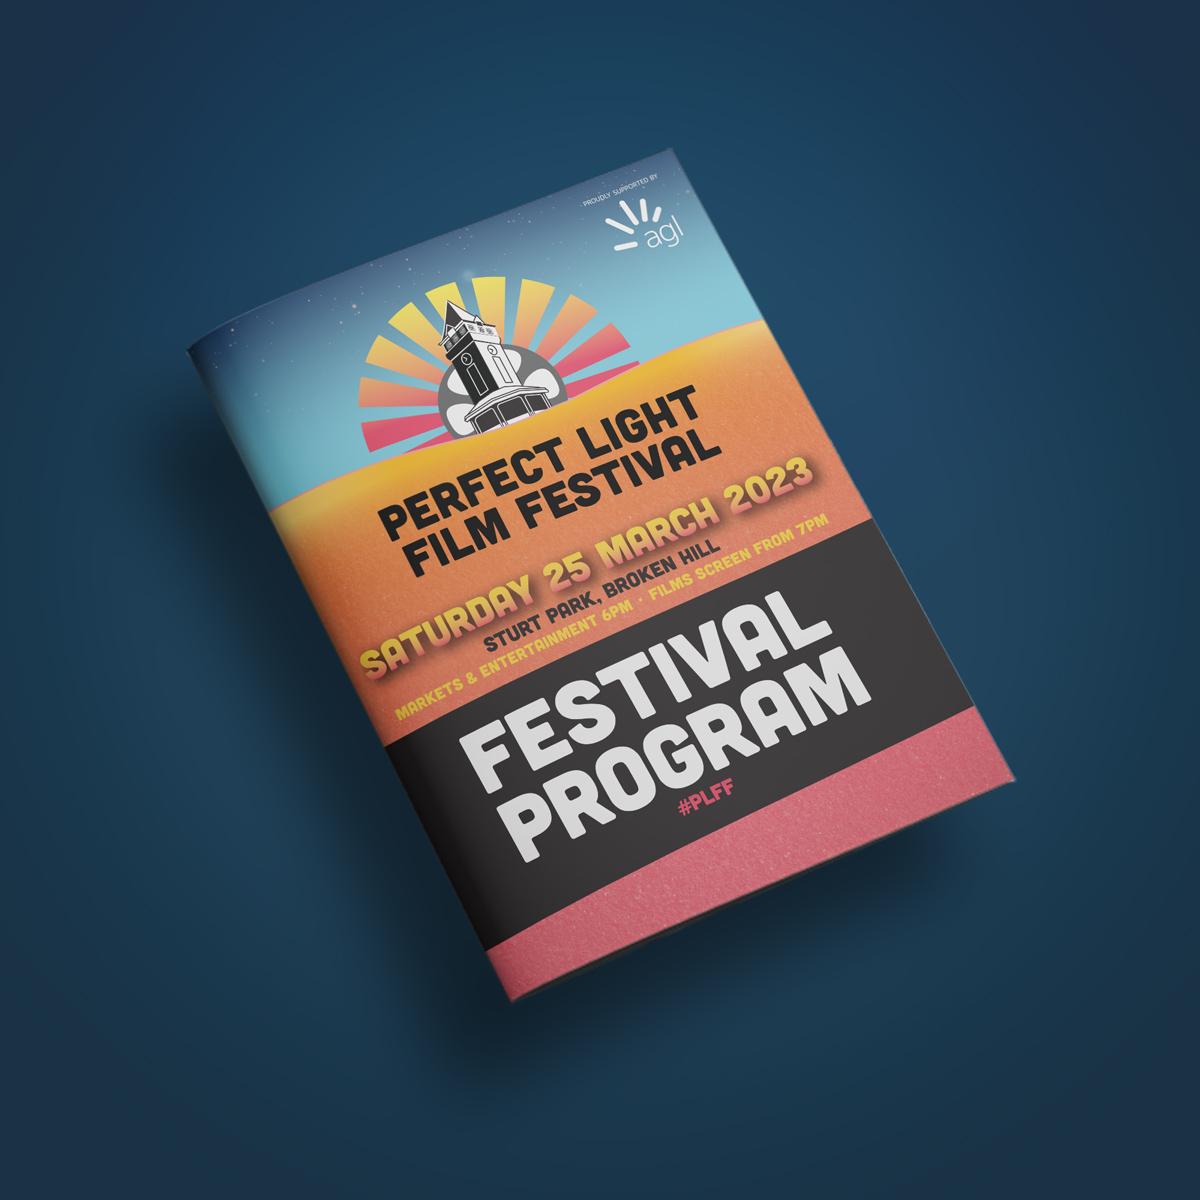 Cover of program booklet design